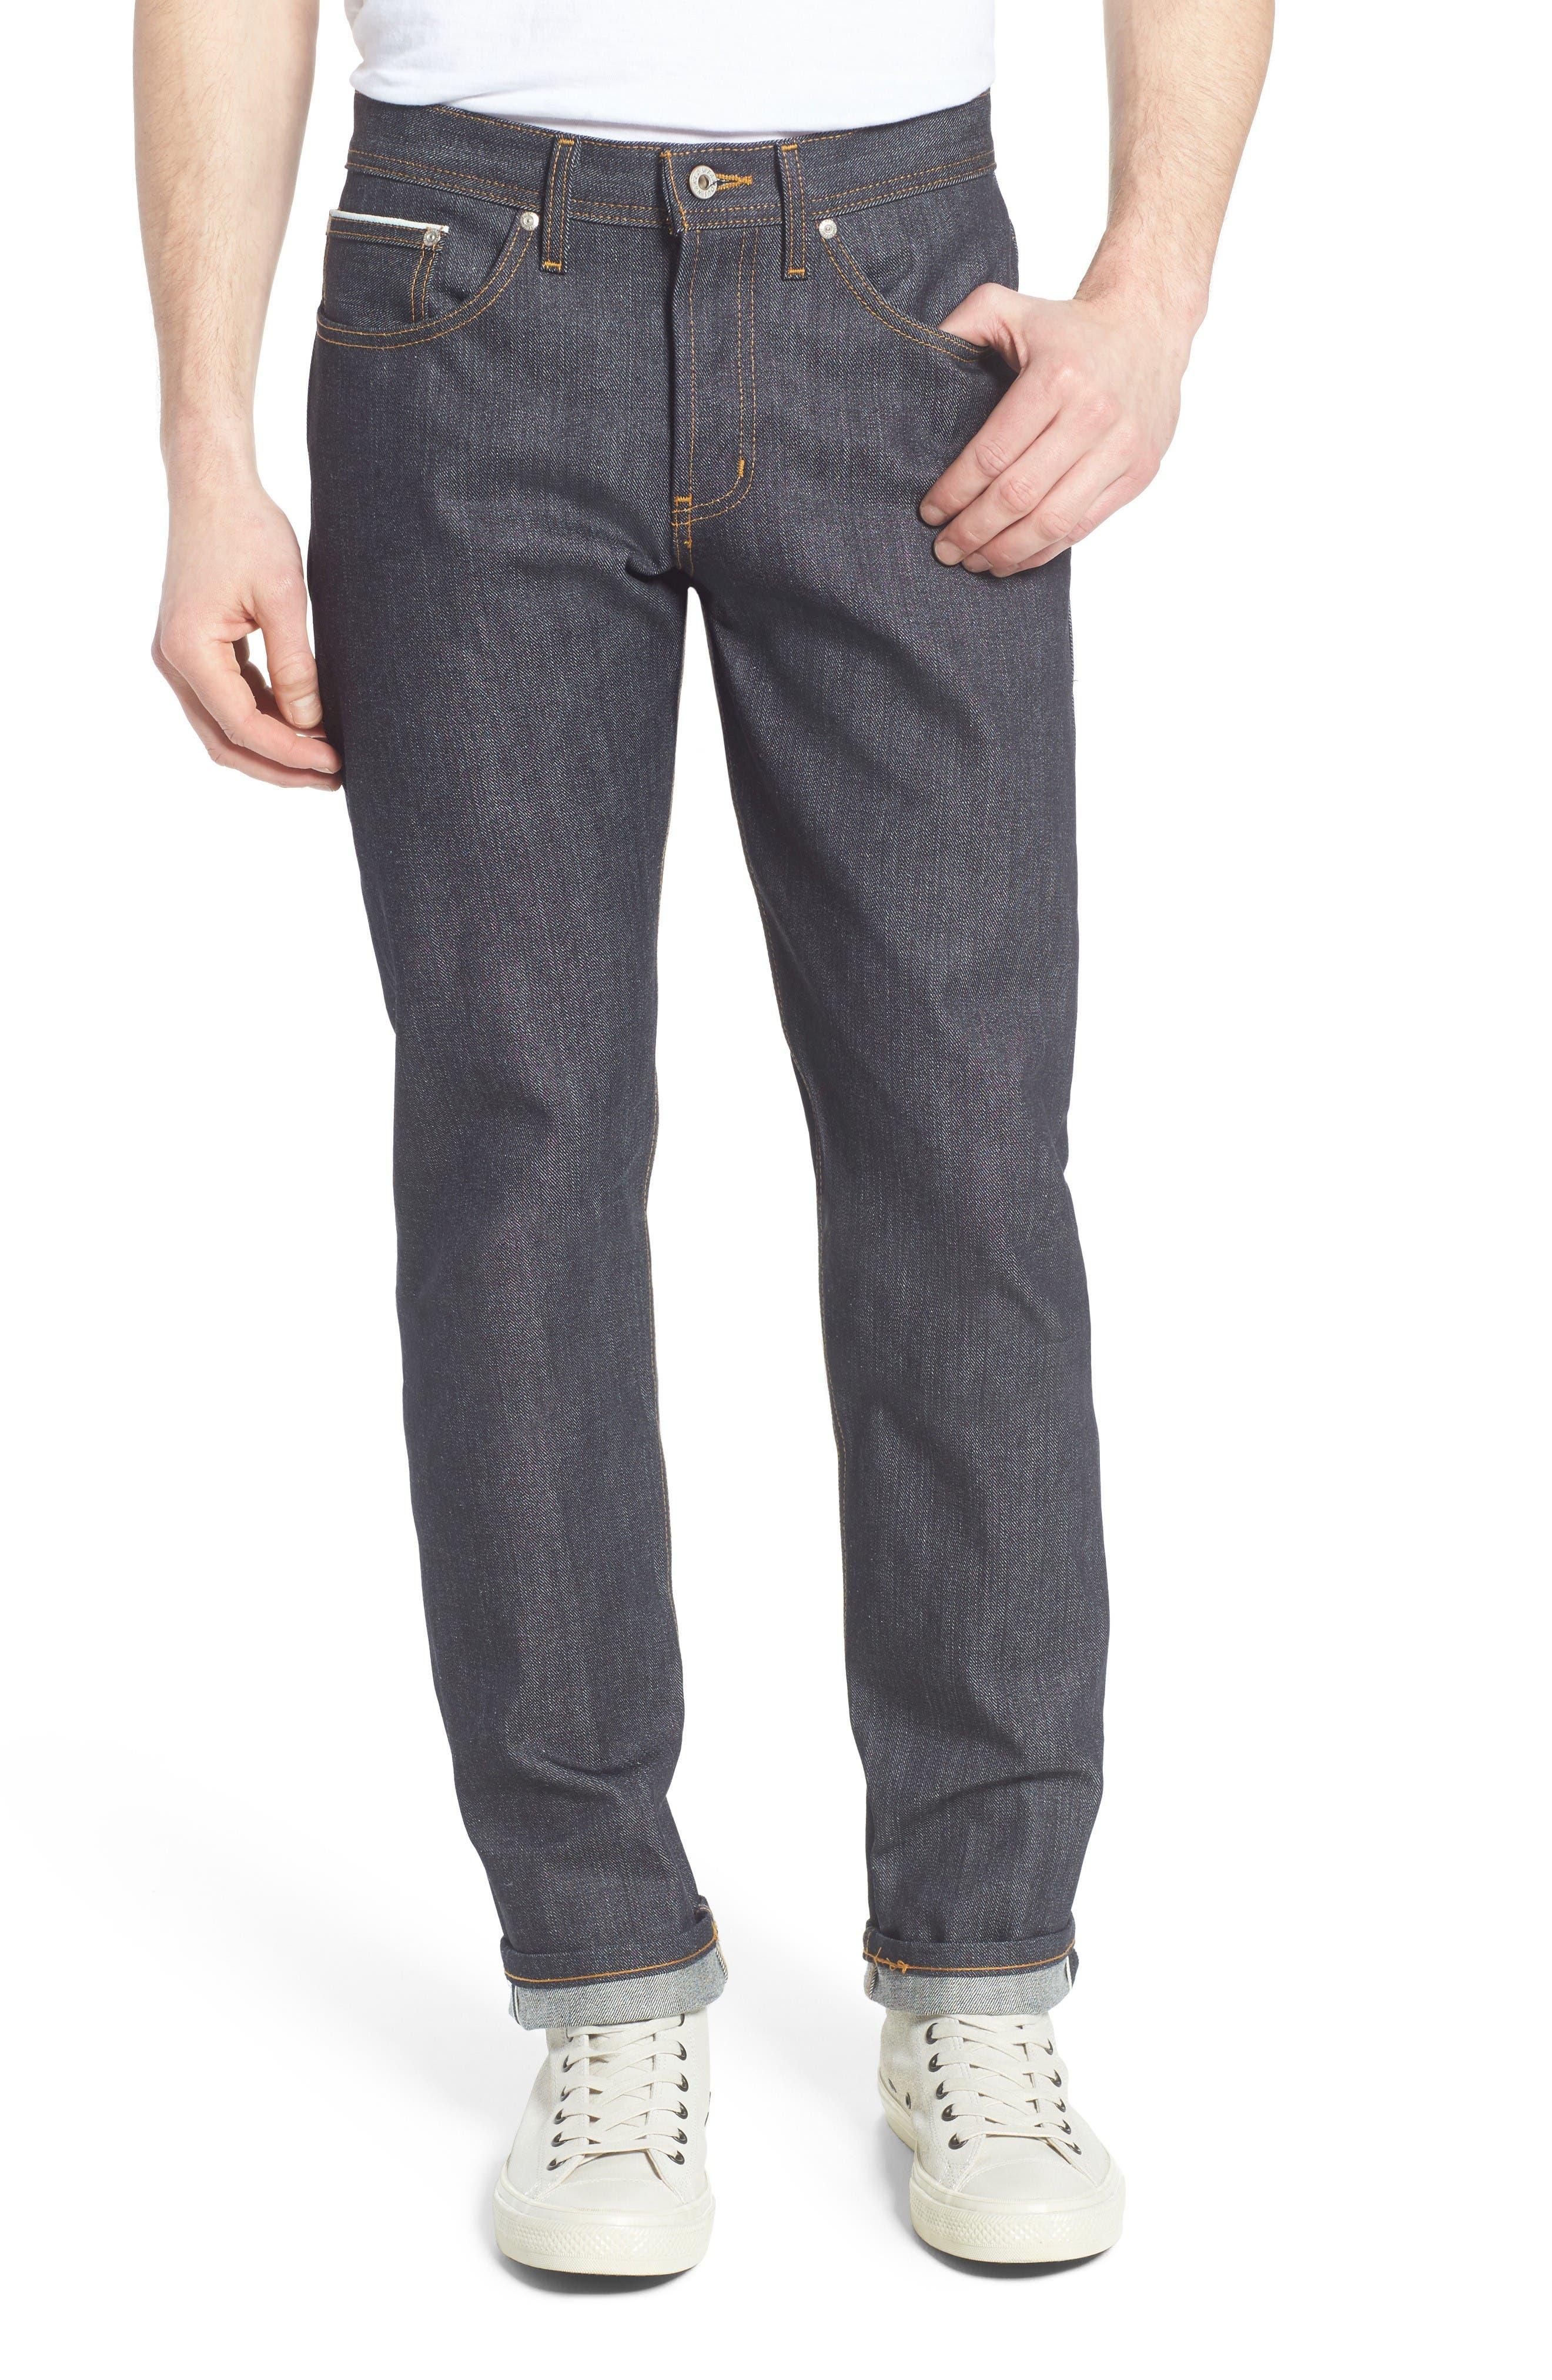 Alternate Image 1 Selected - Naked & Famous Denim Weird Guy Slim Fit Jeans (Left Hand Twill Selvedge)